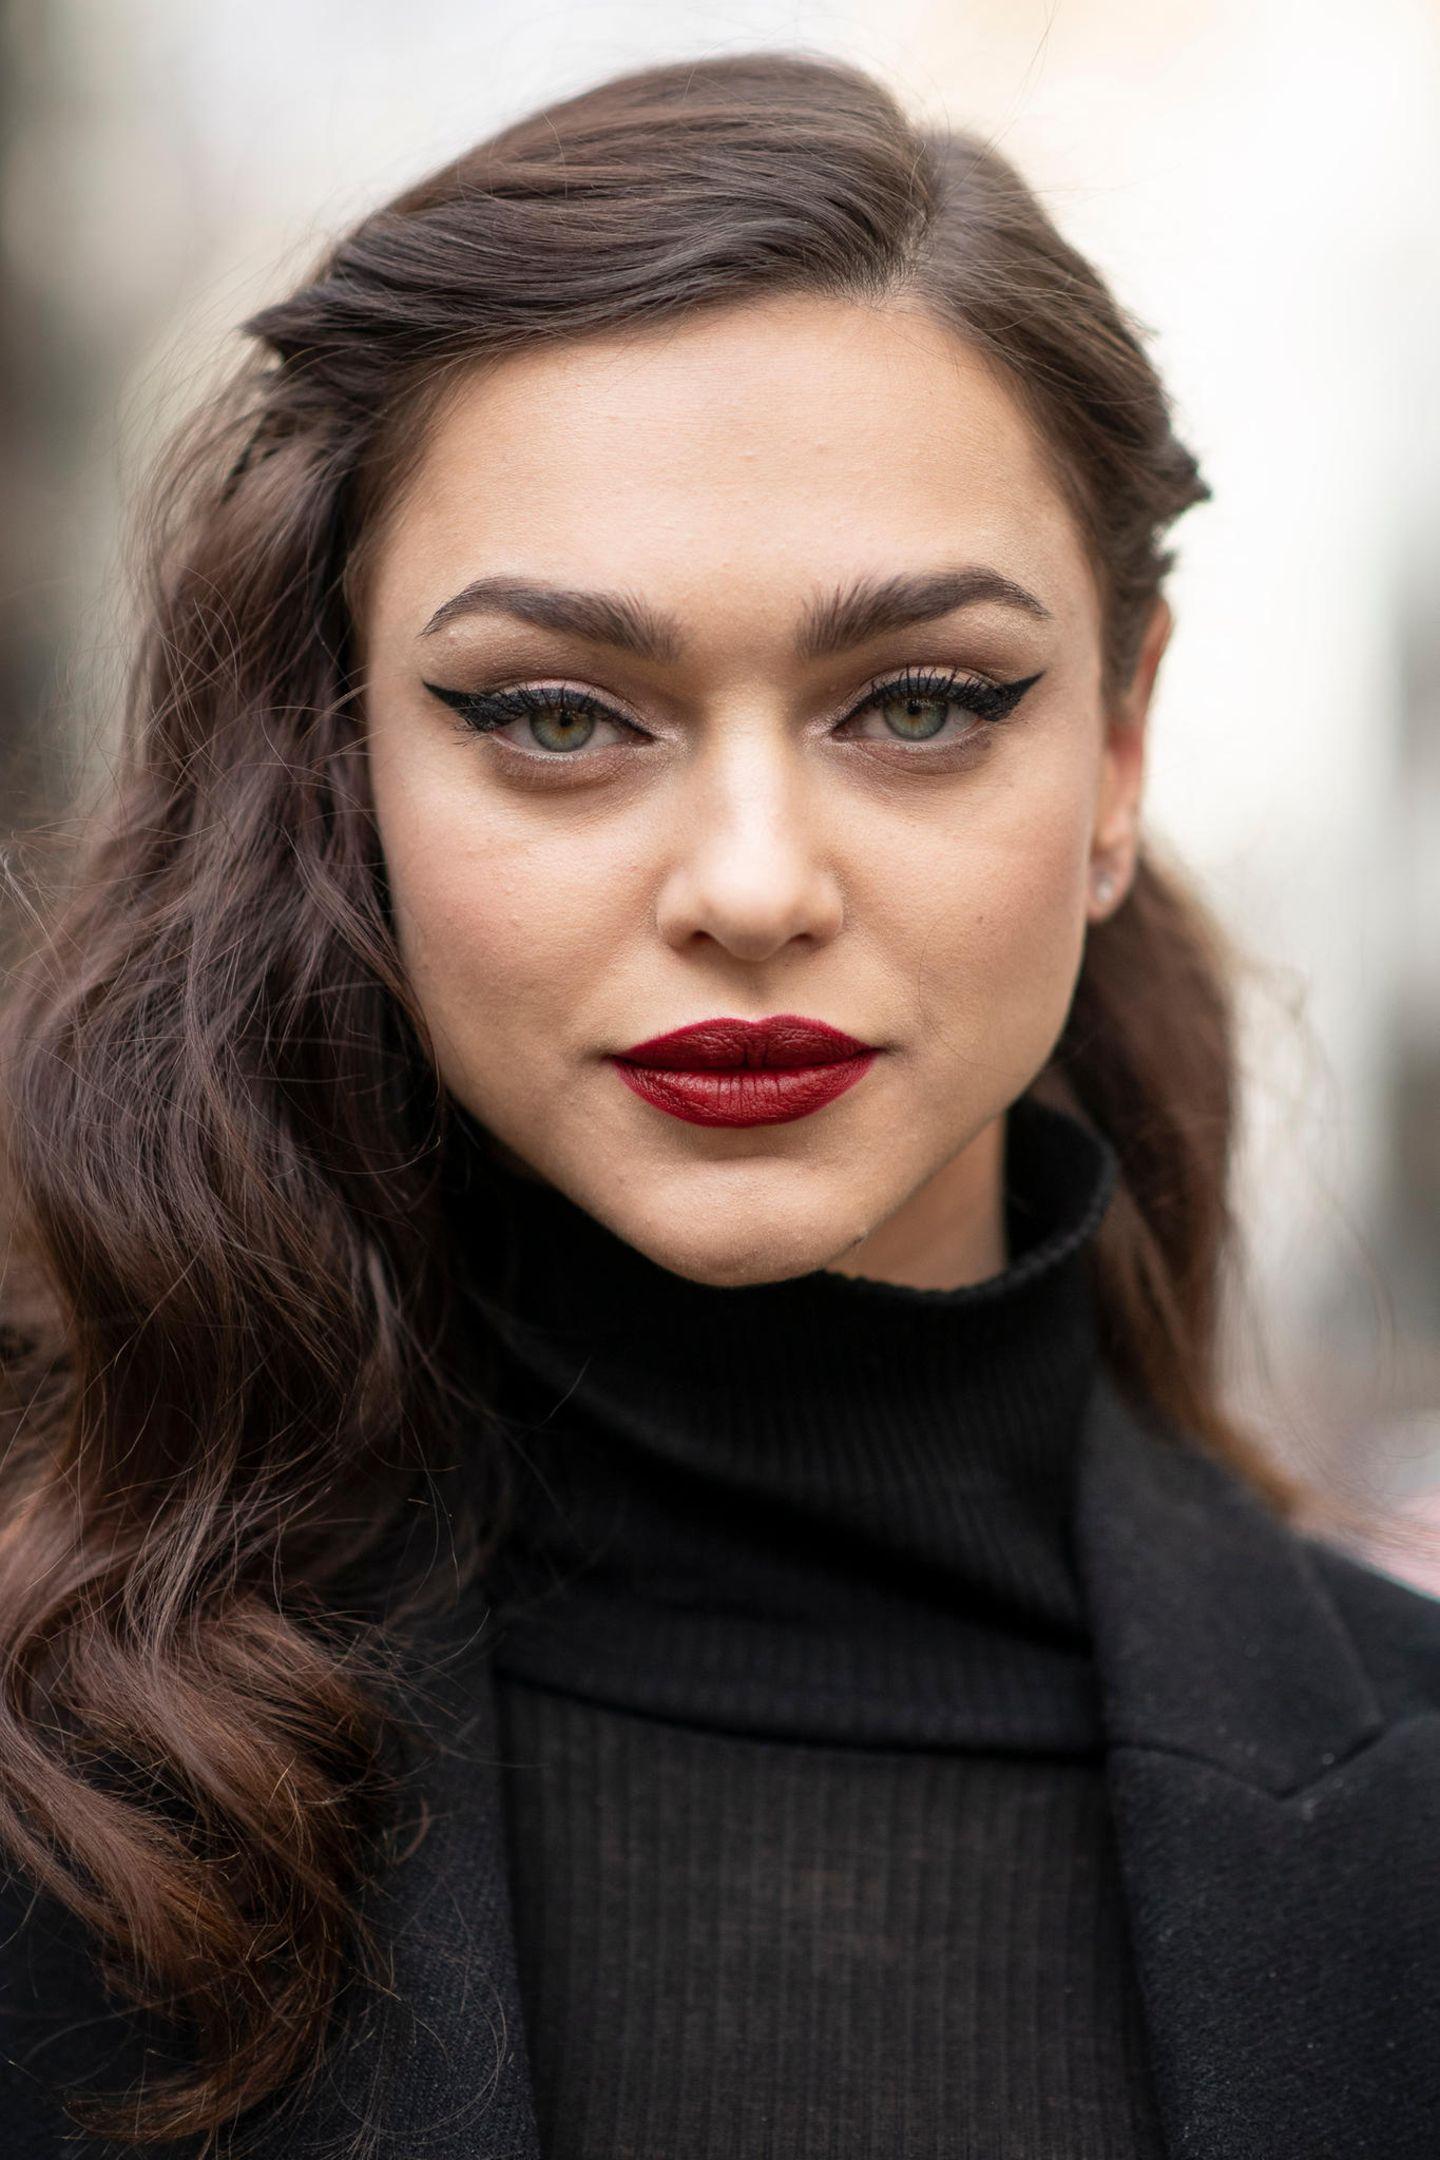 Herbst-Frisuren: Frau blickt in die Kamera